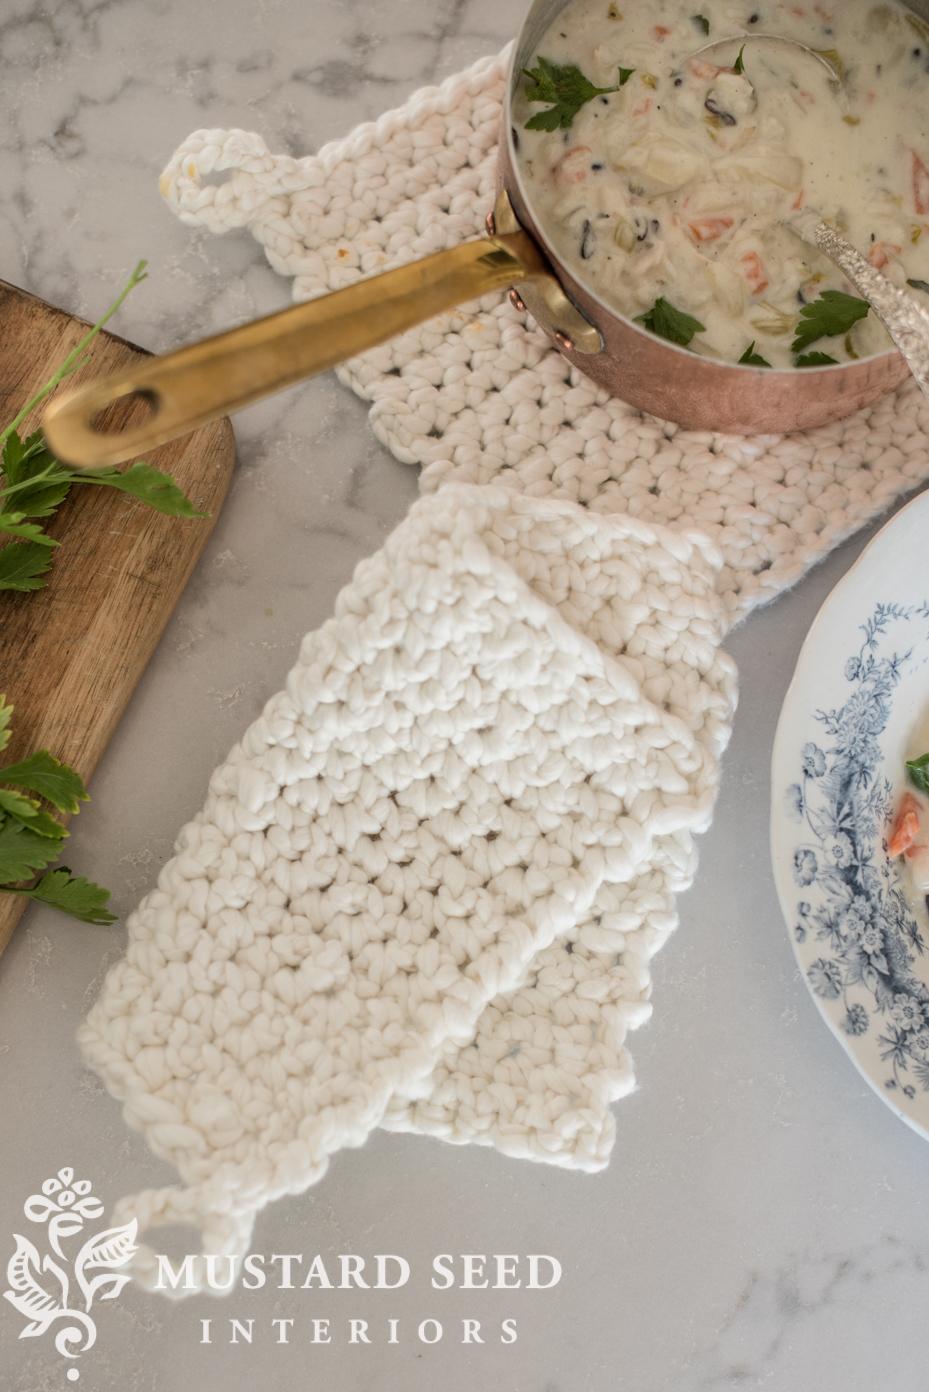 Crochet Potholder Tutorial For Beginners Miss Mustard Seed